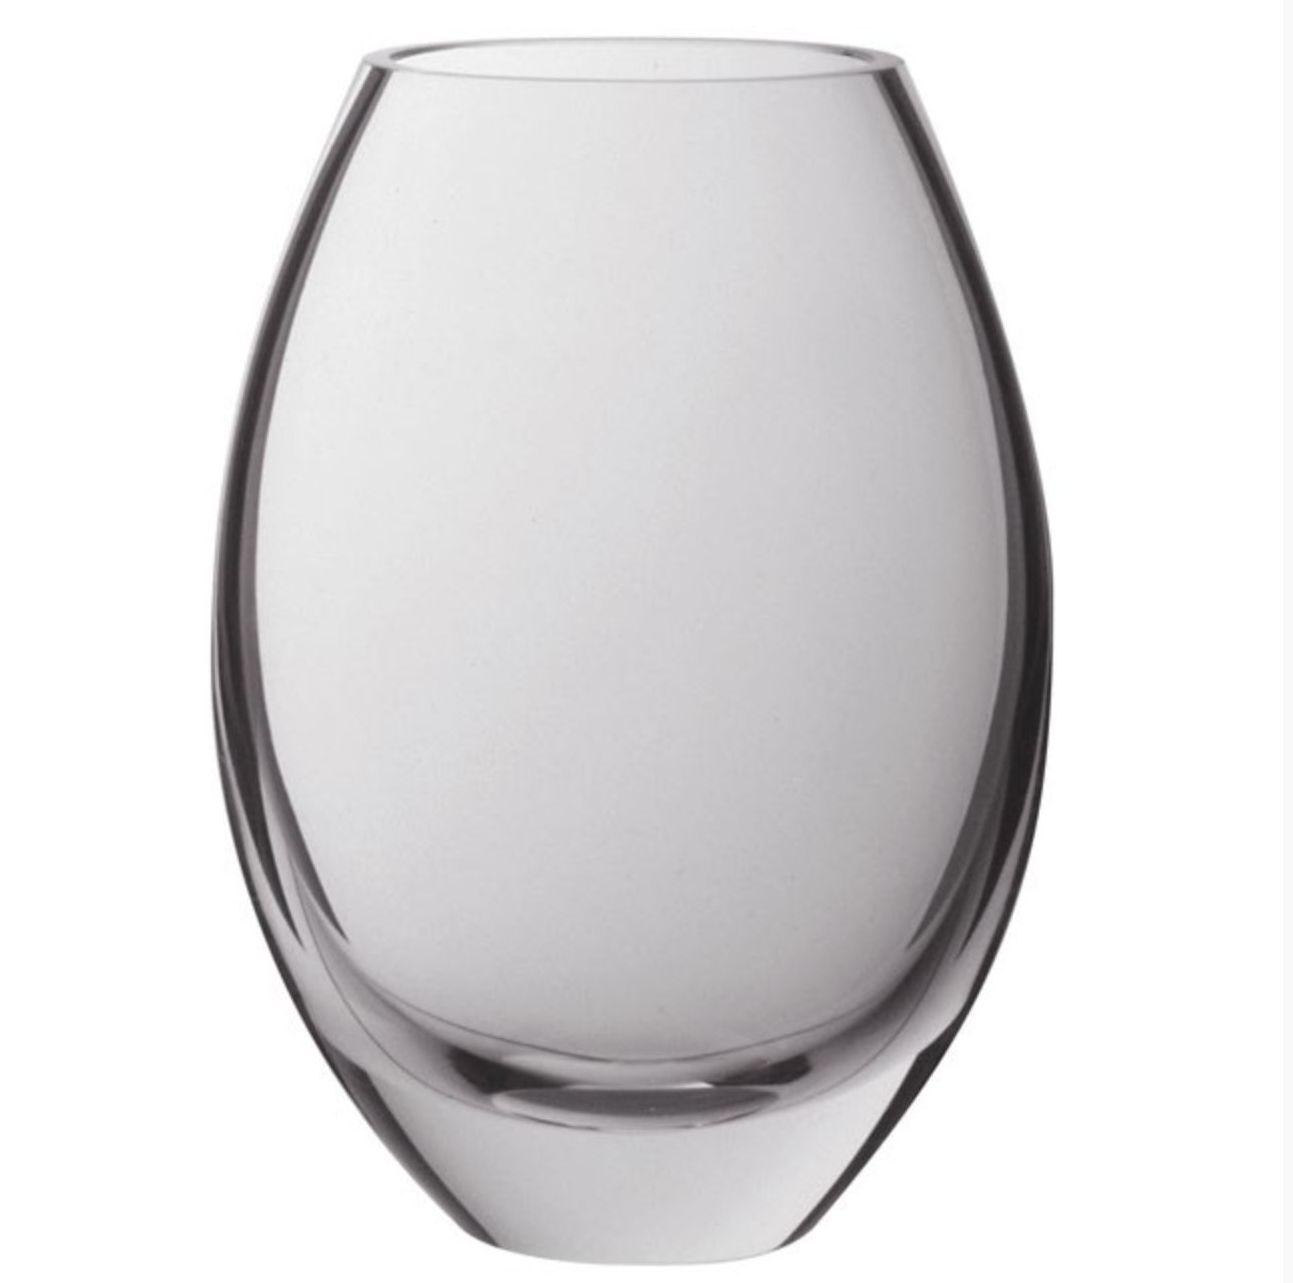 Dartington crystal product categories michael virden glass dartington opus medium oval vase reviewsmspy